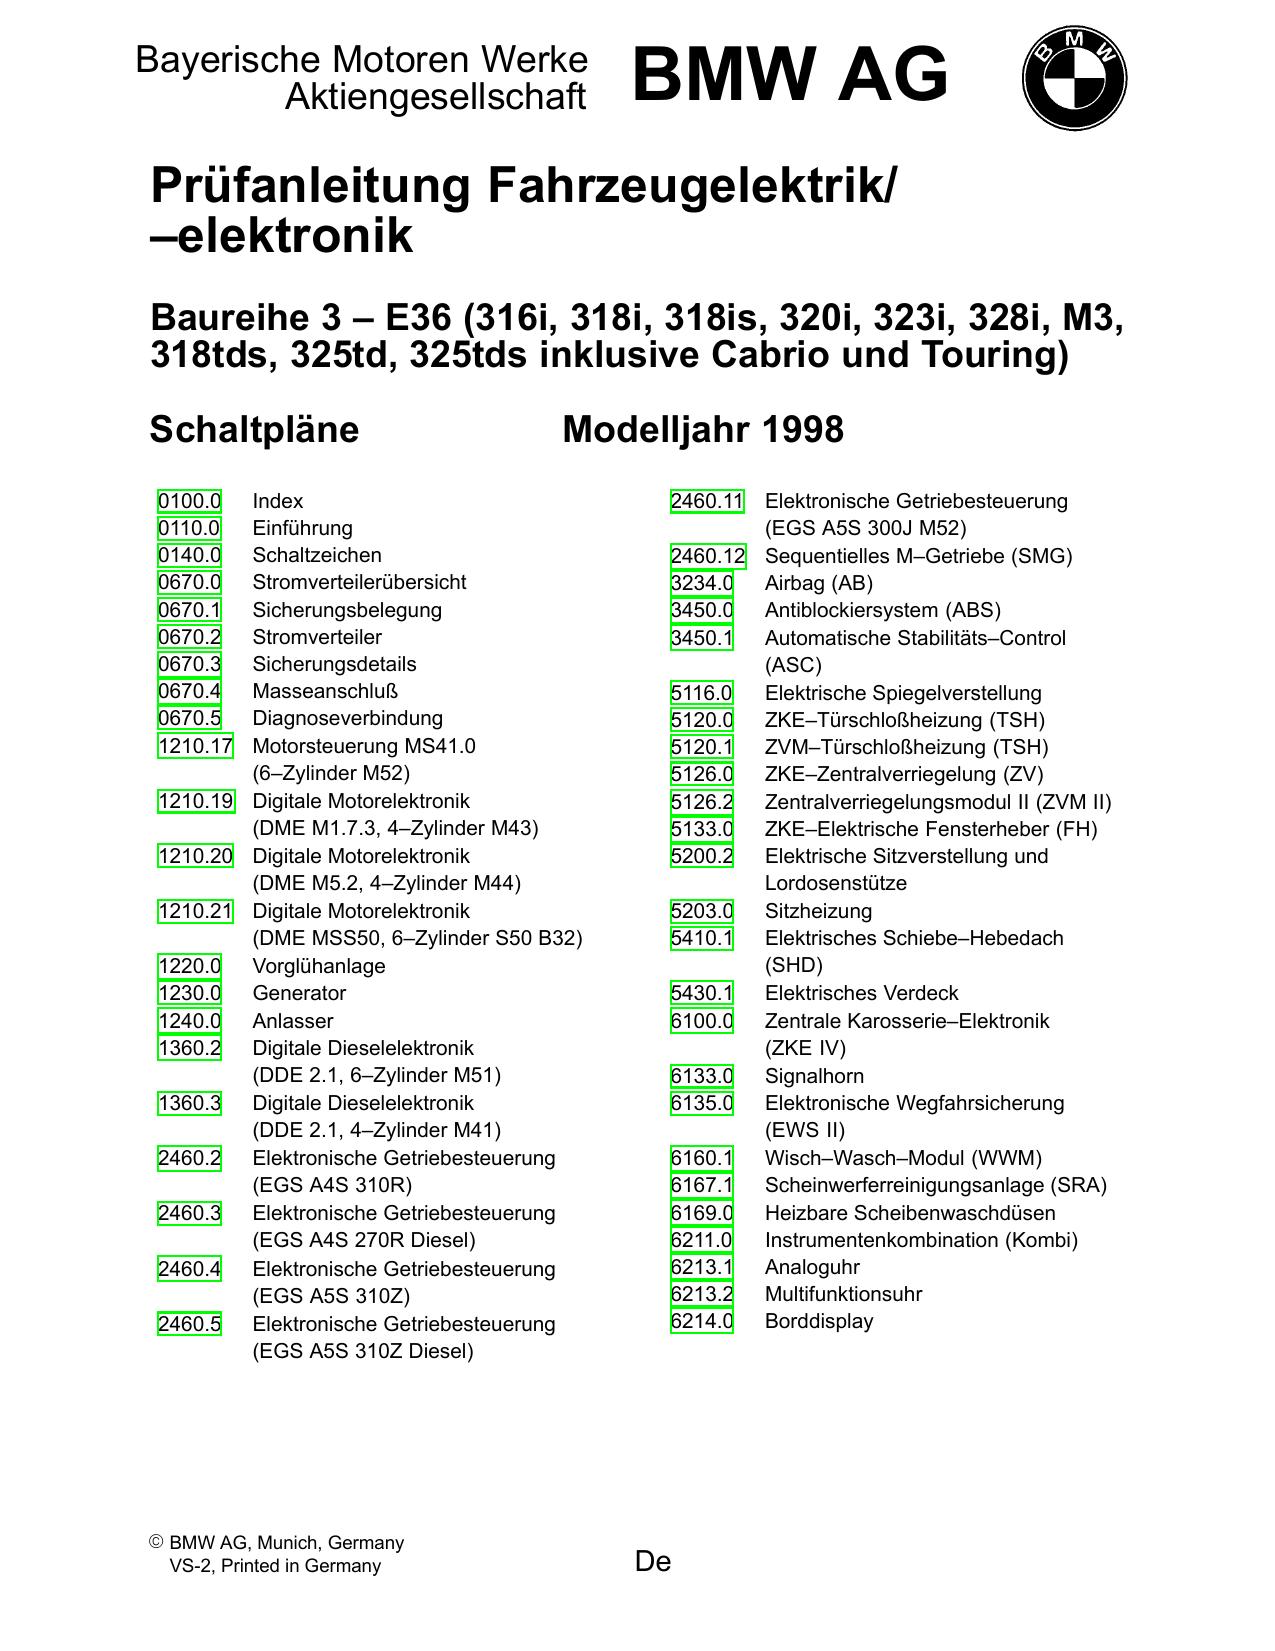 Prüfanleitung Fahrzeugelektrik/ –elektronik - Motor-Talk | manualzz.com